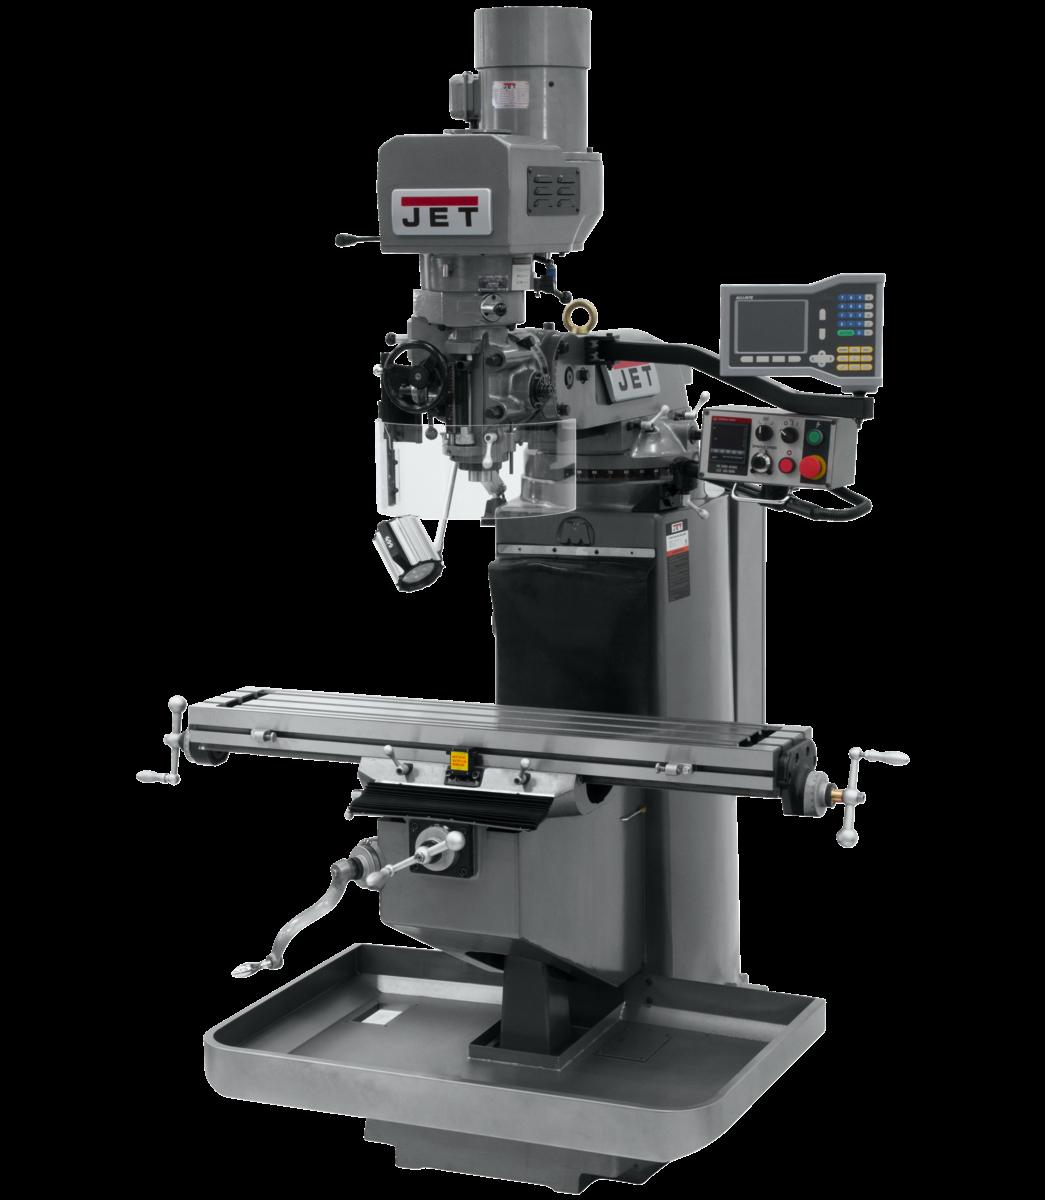 JTM-949EVS/230 Electronic Variable Speed Vertical Milling Machine 230V 3Ph